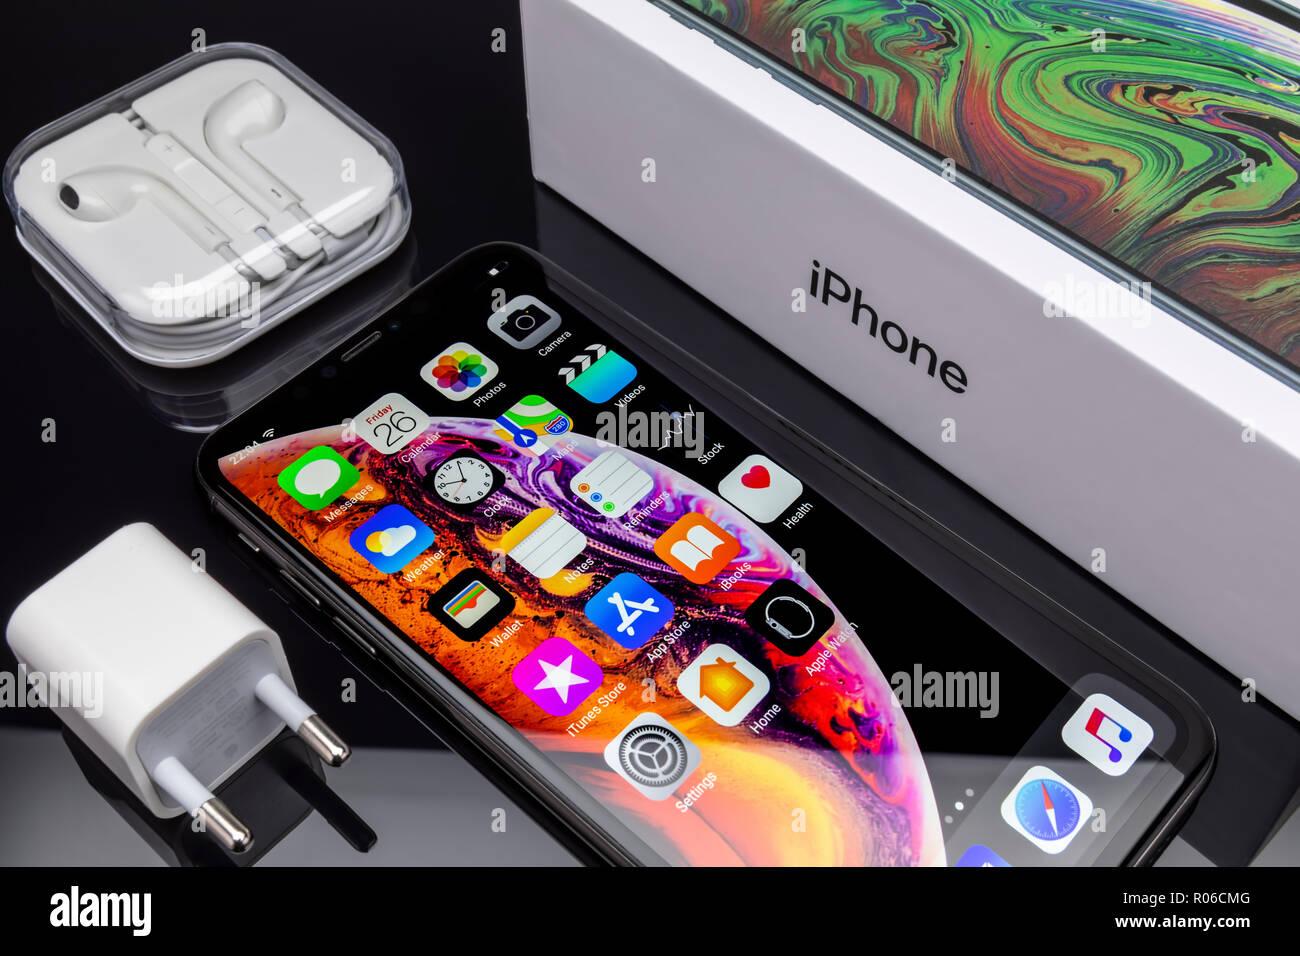 Galati, Romania - October 26, 2018: Apple launch the new smartphone iPhone XS and iPhone XS Max. iPhone Xs Max on black background. - Stock Image